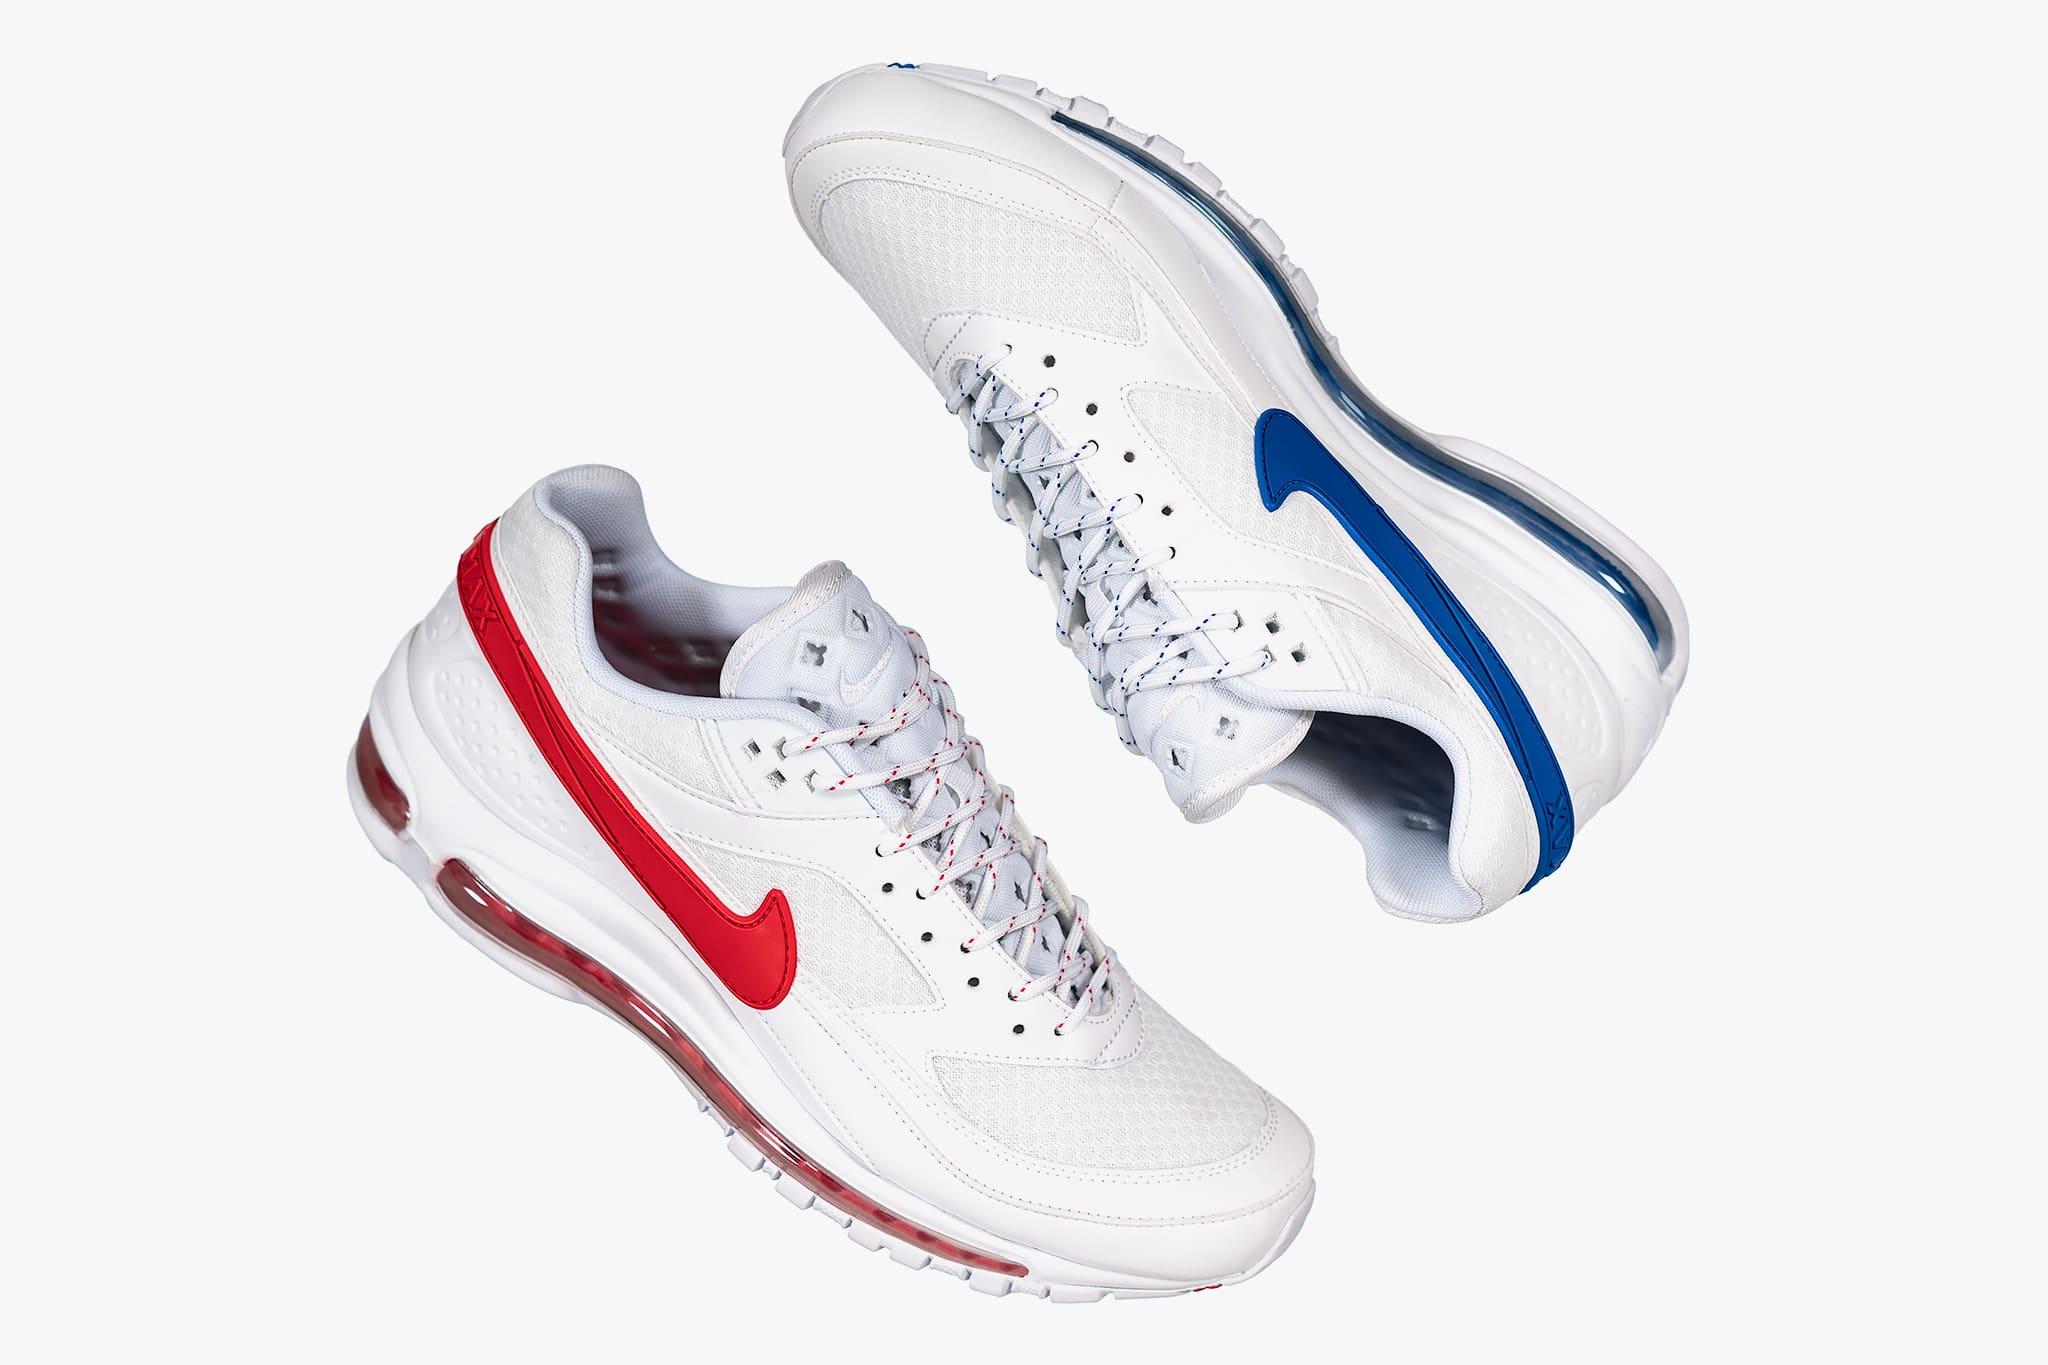 new style 06abd 762b9 Nike-x-Skepta-Ai-Max-97-BW-SS18-May-News qwrlgd.jpg